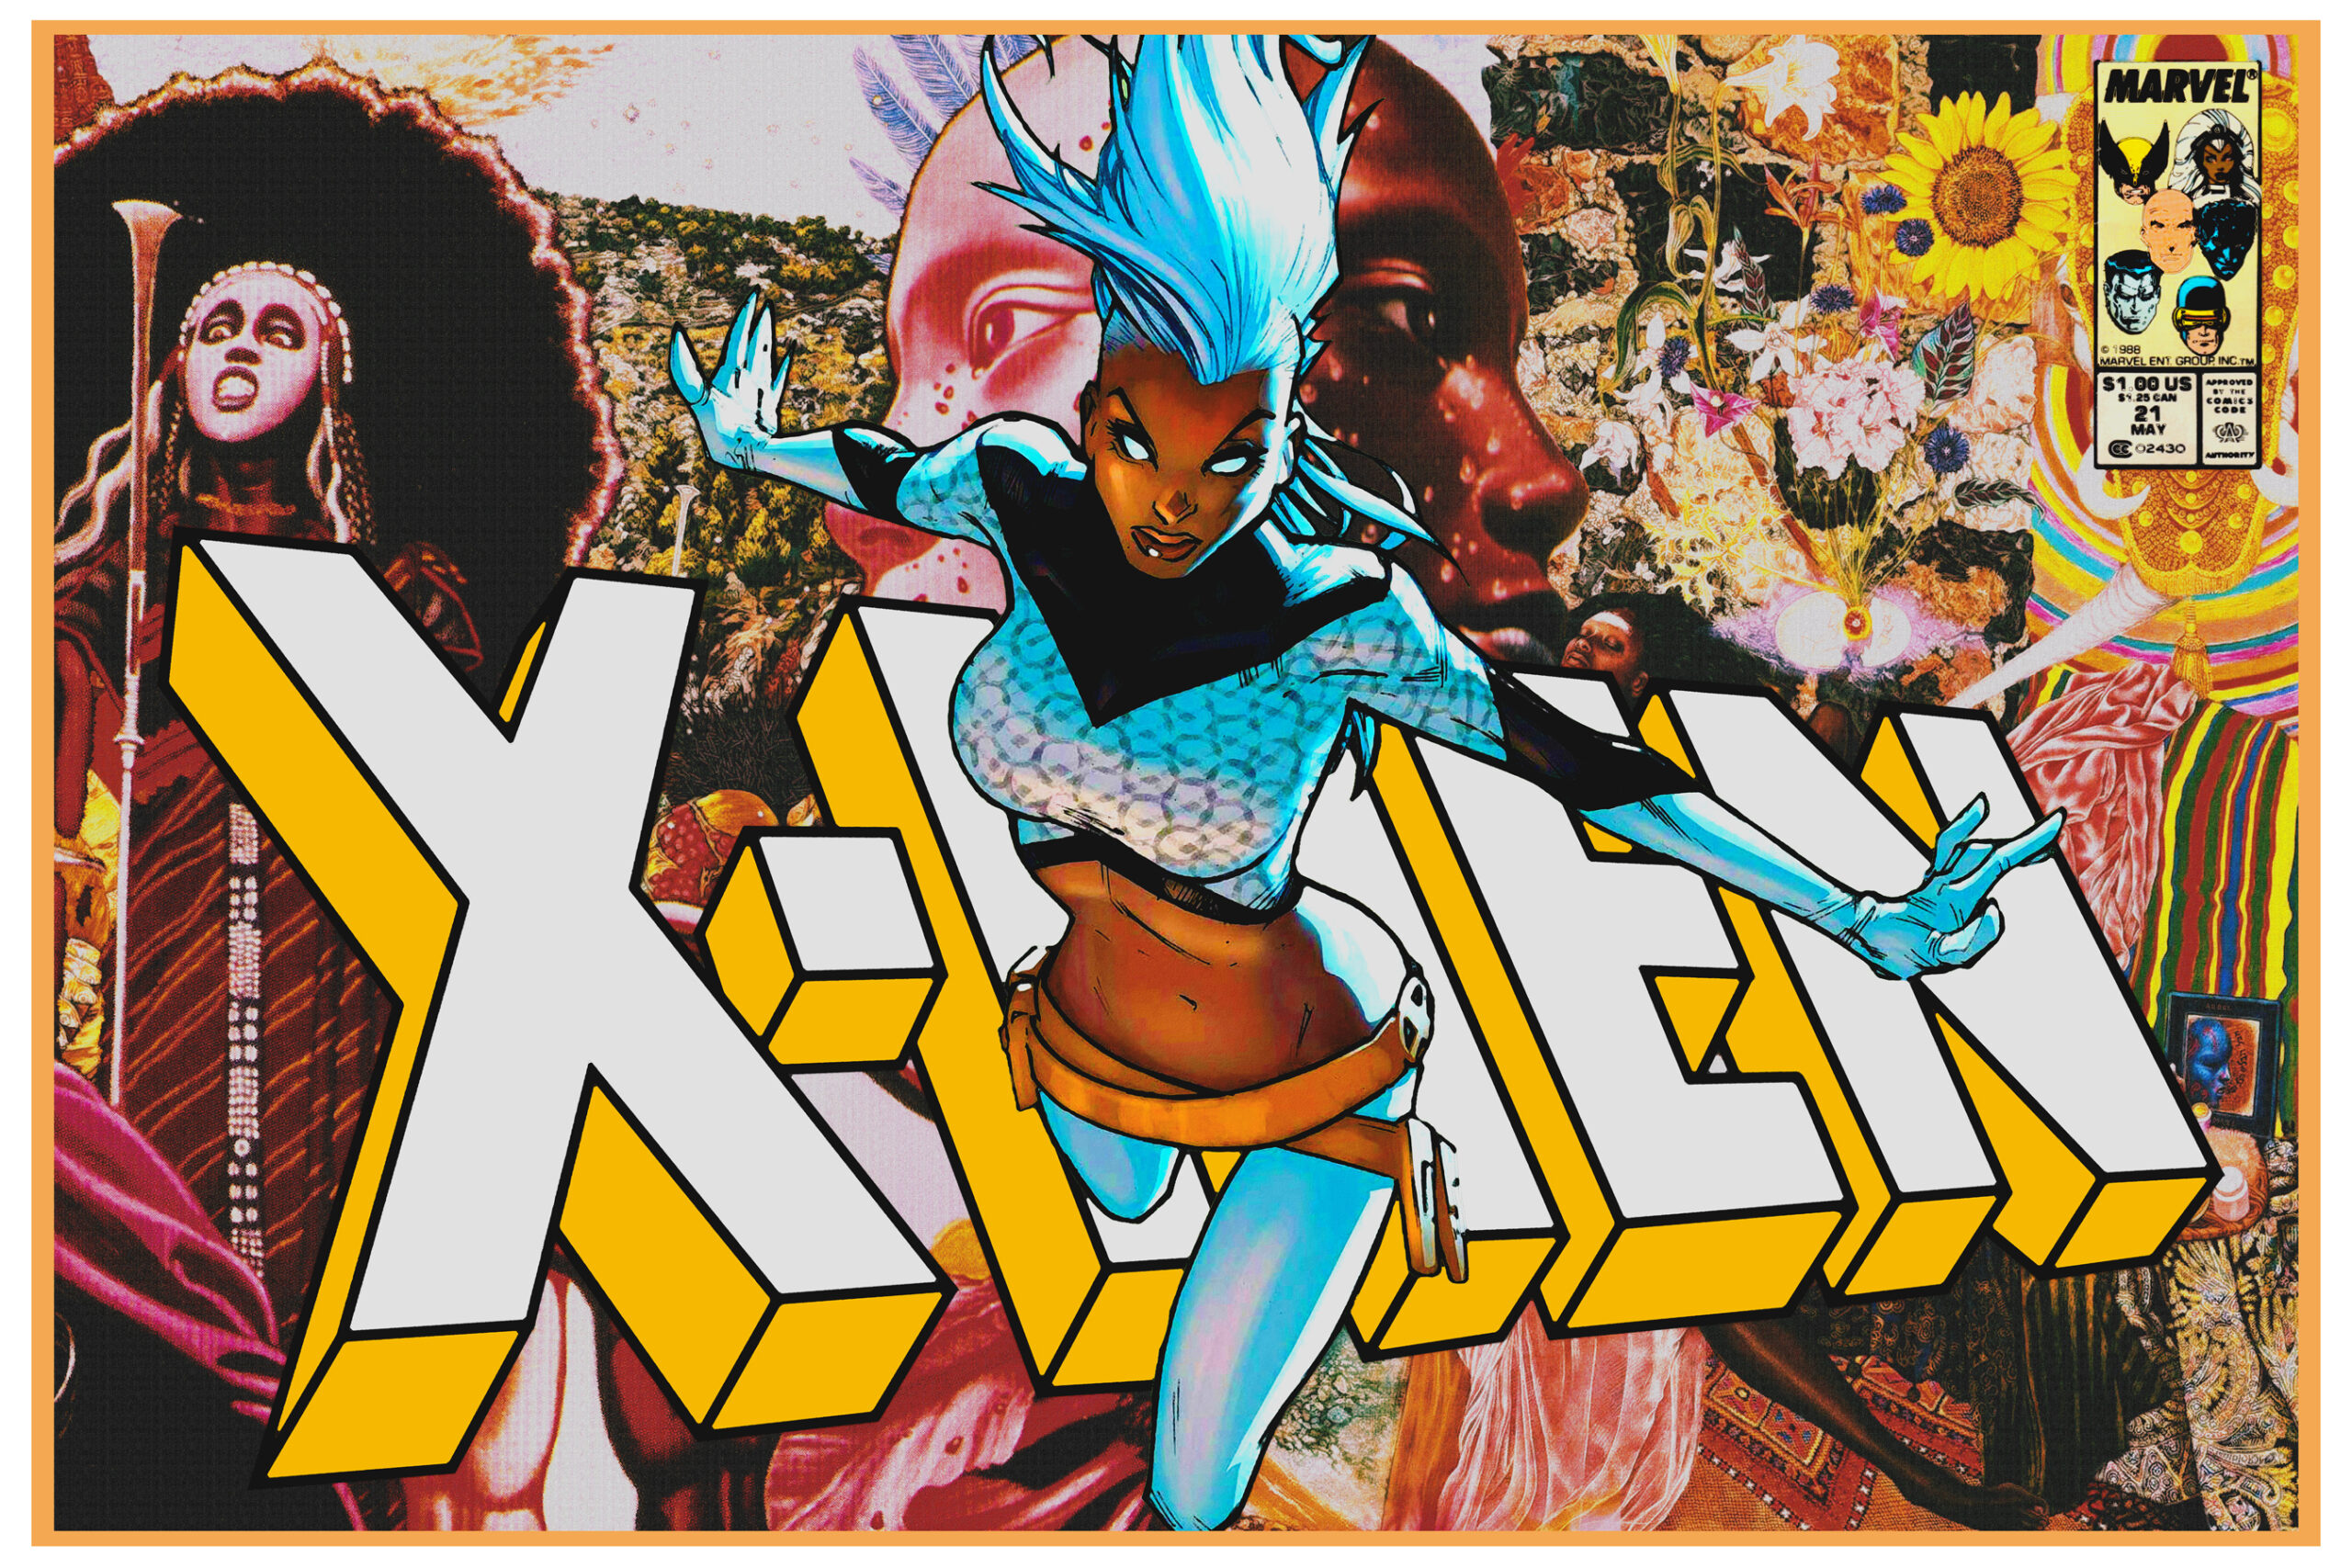 Black superhero from x-men